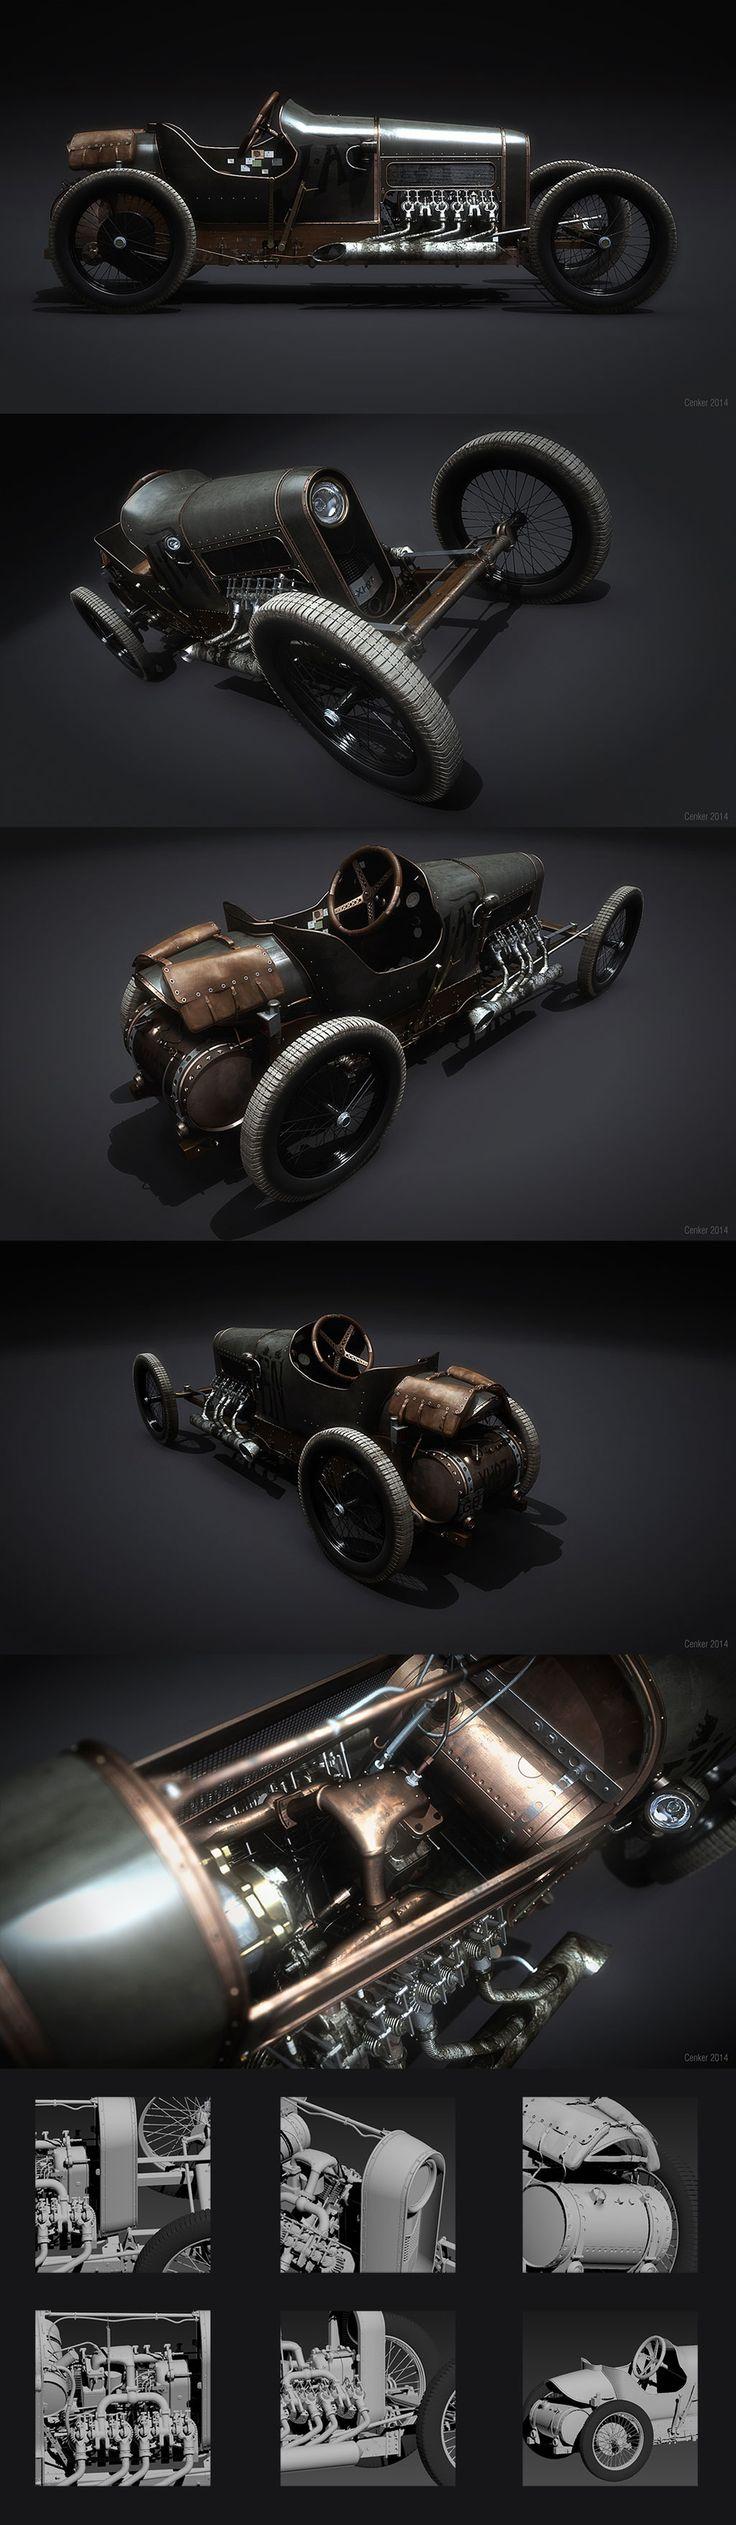 http://emincenker.cgsociety.org/art/cyclecar-transport-3d-1218162